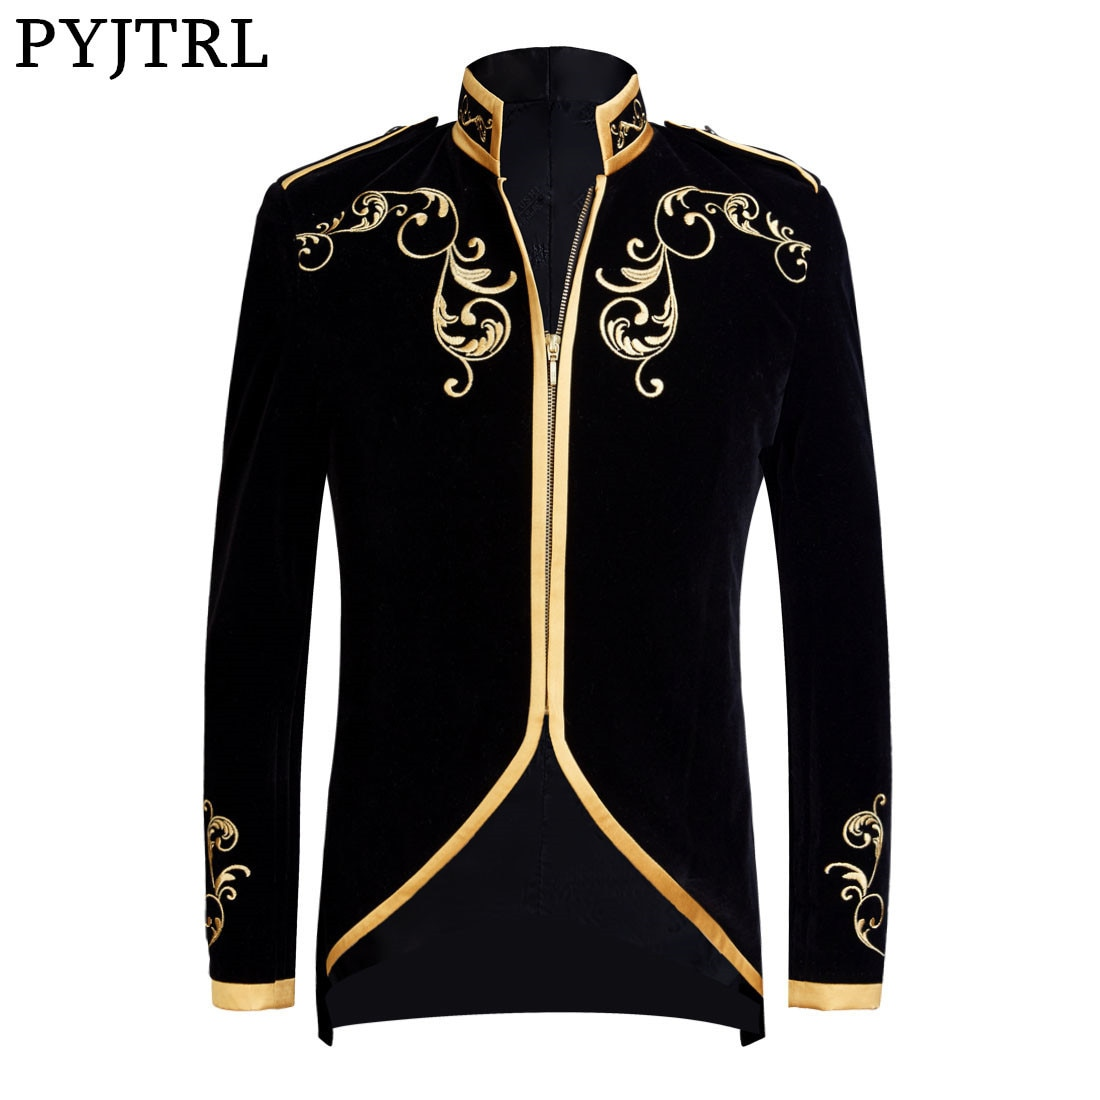 PYJTRL Velvet Embroidery Series Men British Style Palace Prince Velvet Gold Embroidery Blazer Wedding Groom Singers Suit Jacket